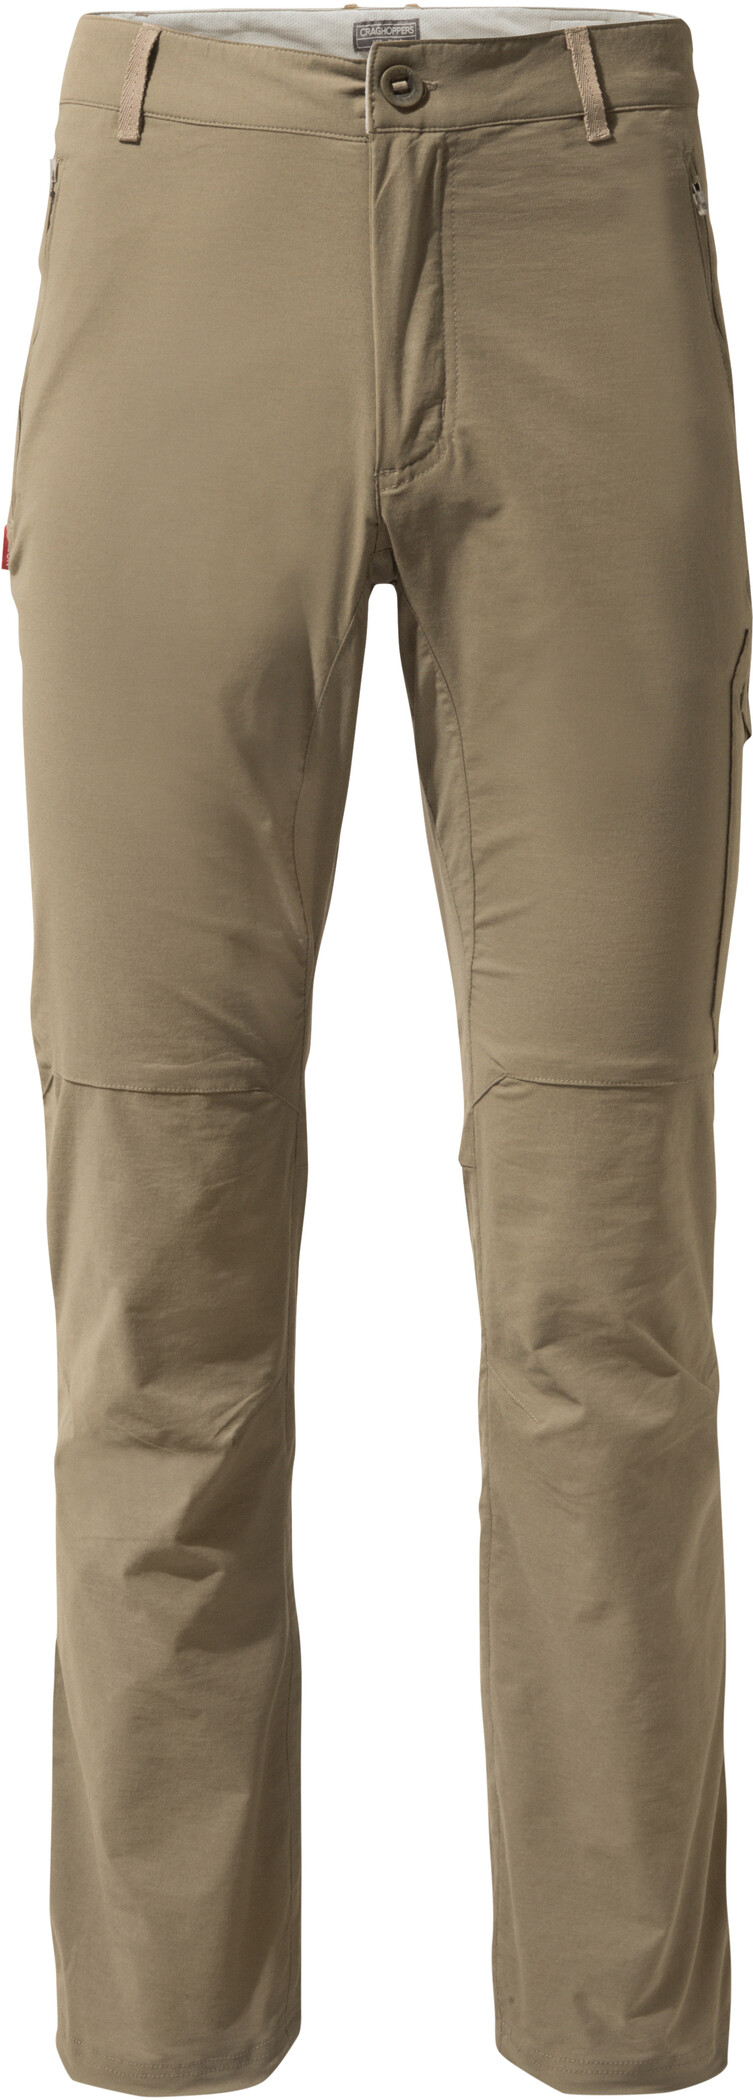 campz.dkmaier sports nil shorts men graphite